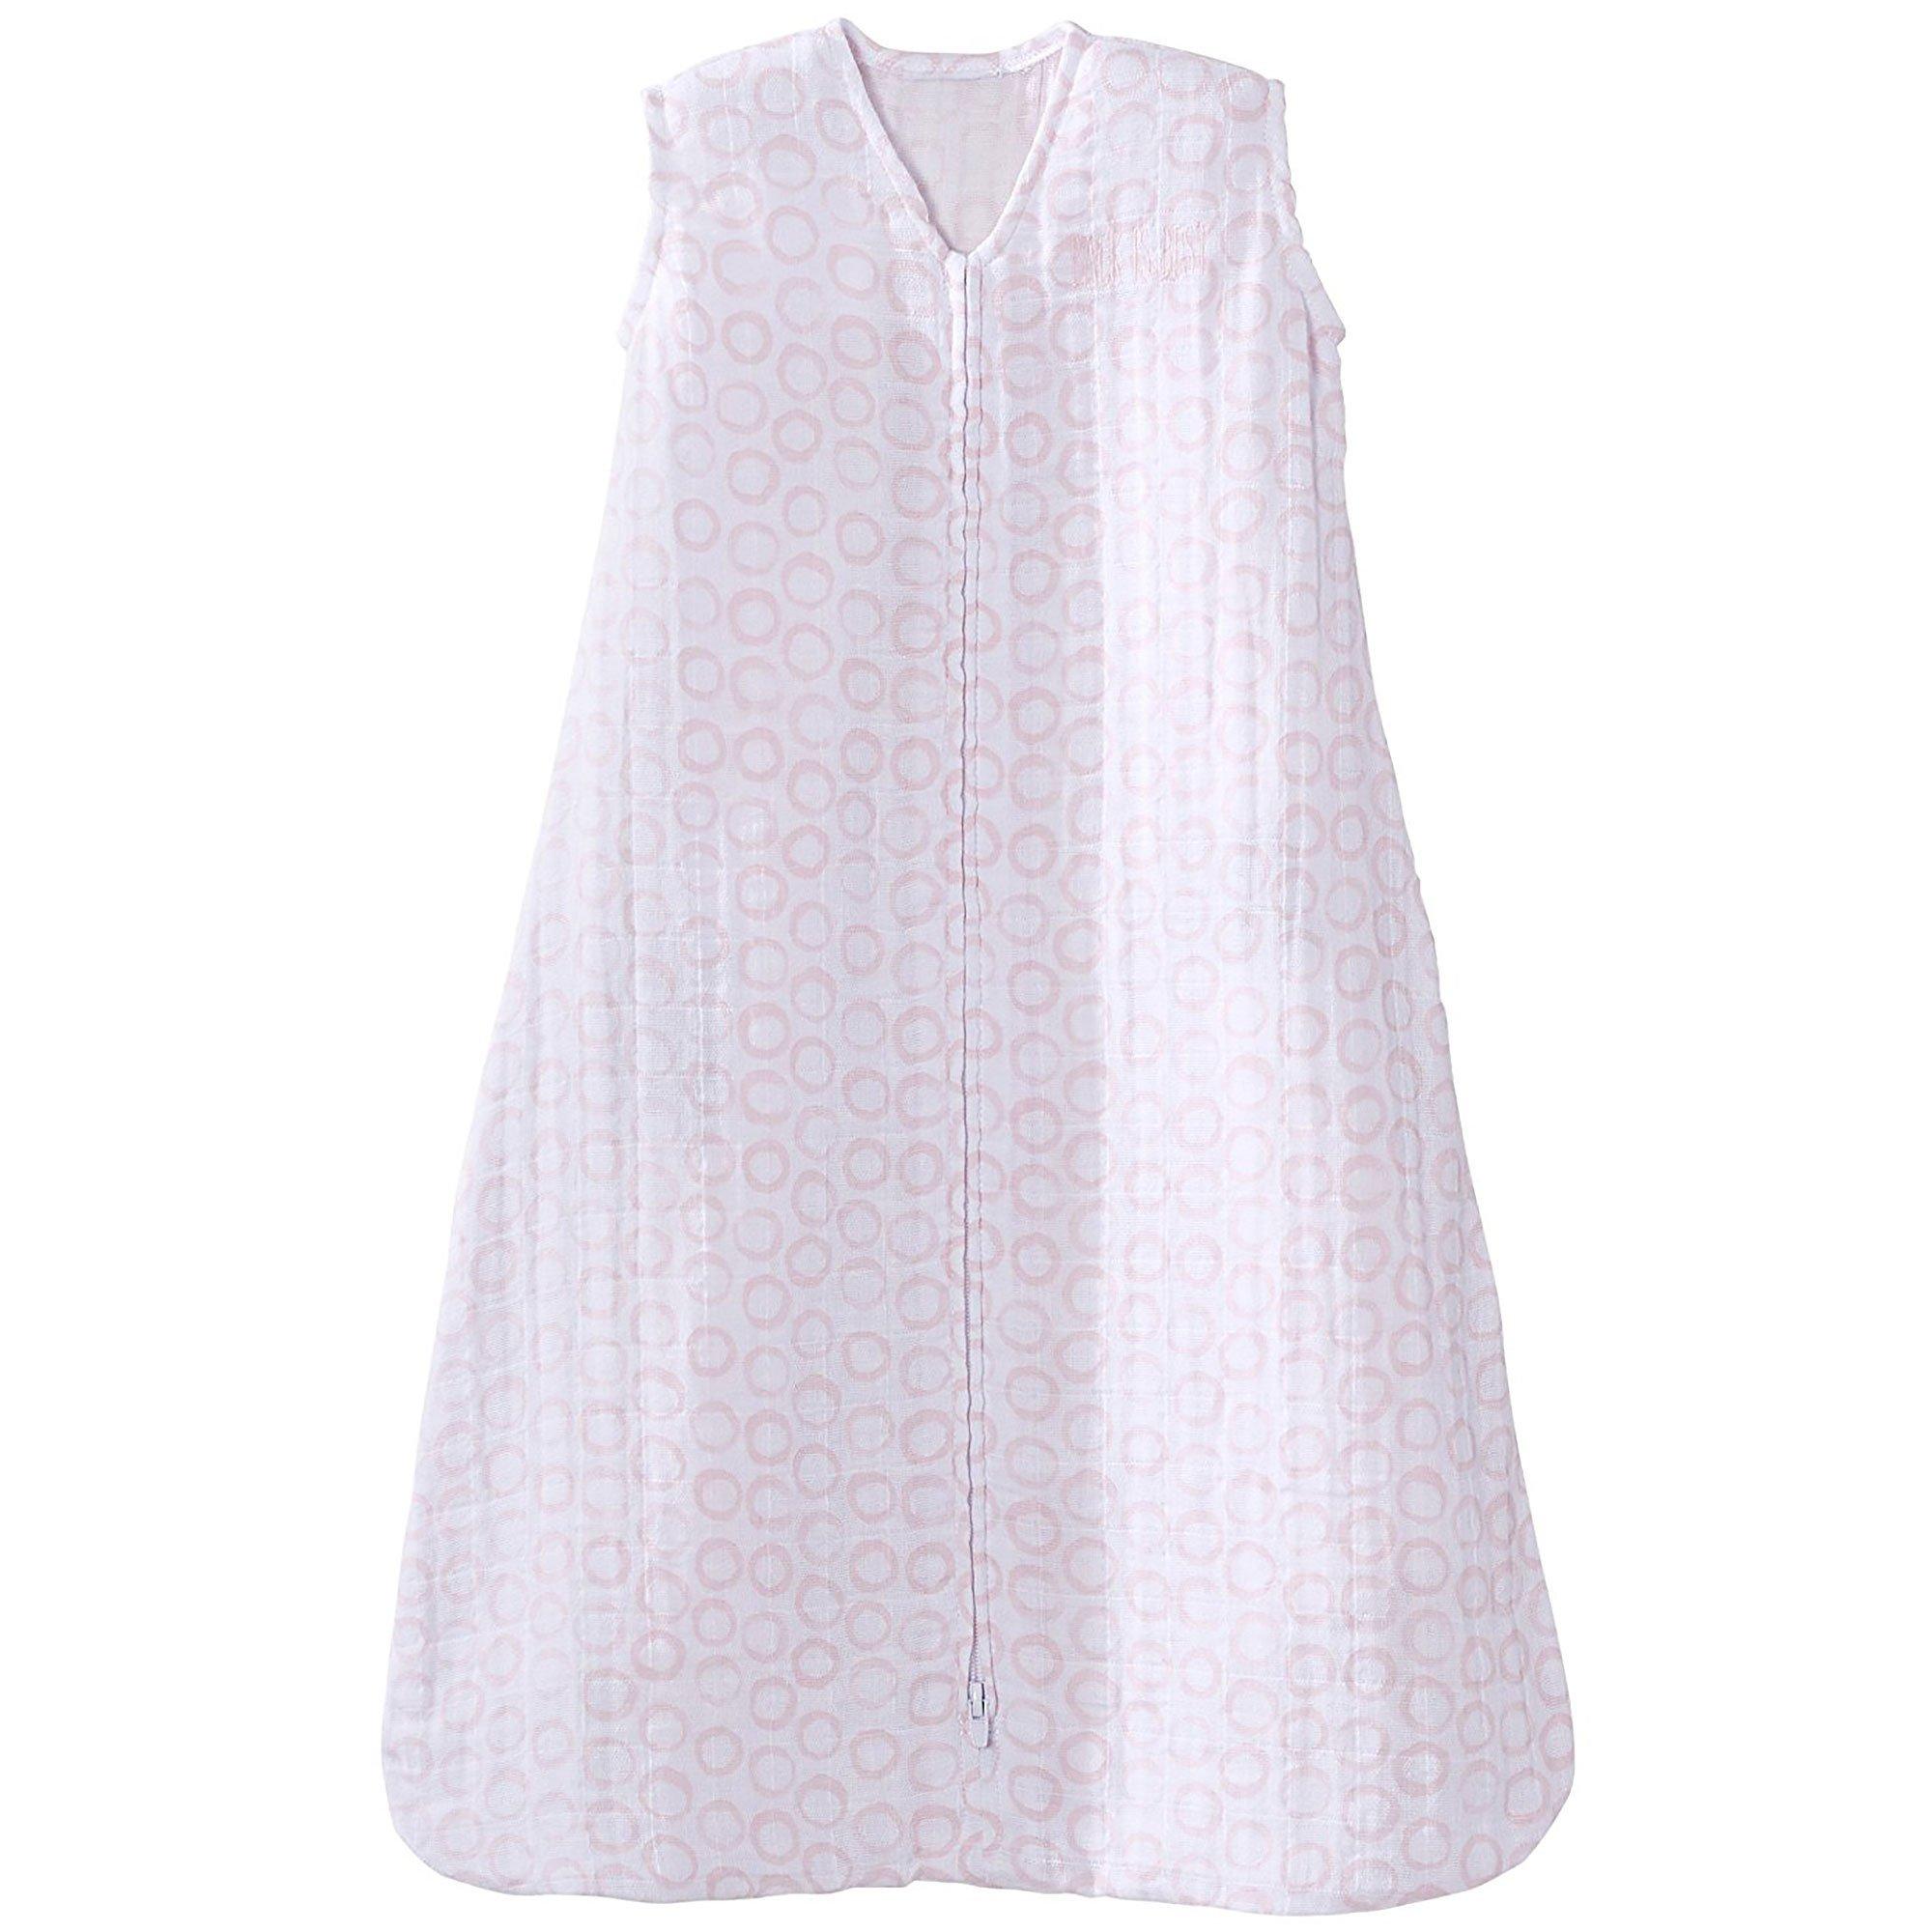 Circles Grey Halo 100/% Cotton Muslin Sleepsack Wearable Blanket X-Large